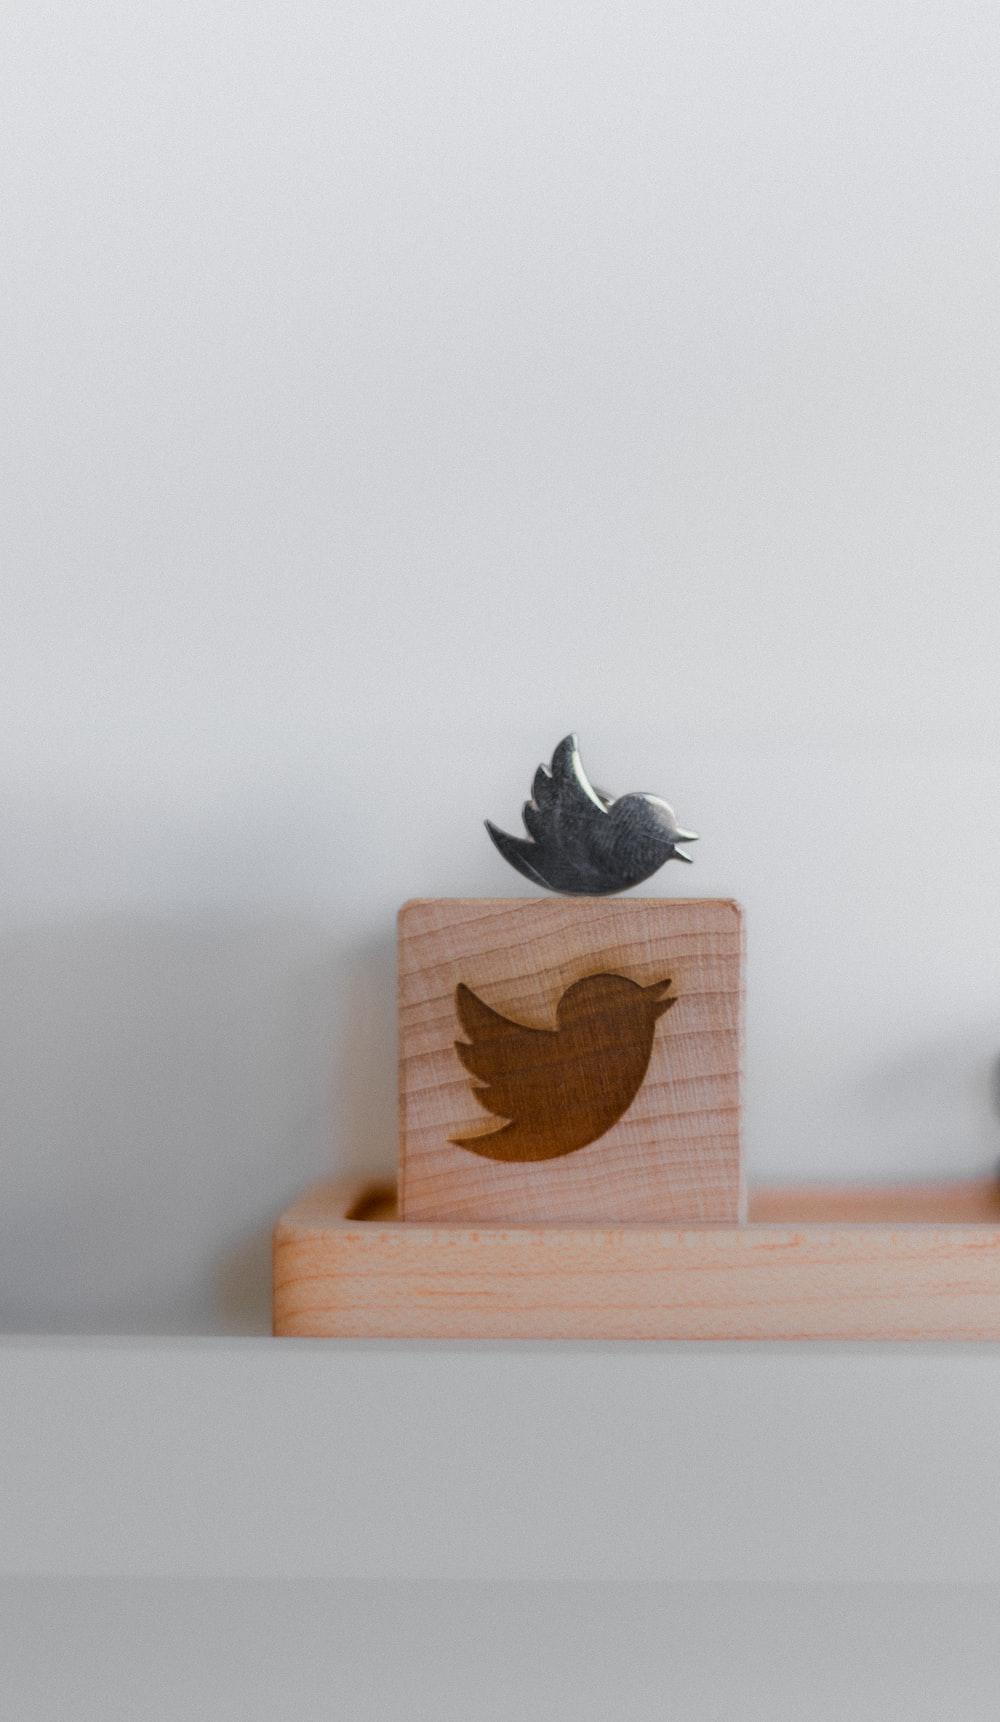 brown wooden bird house on brown wooden box